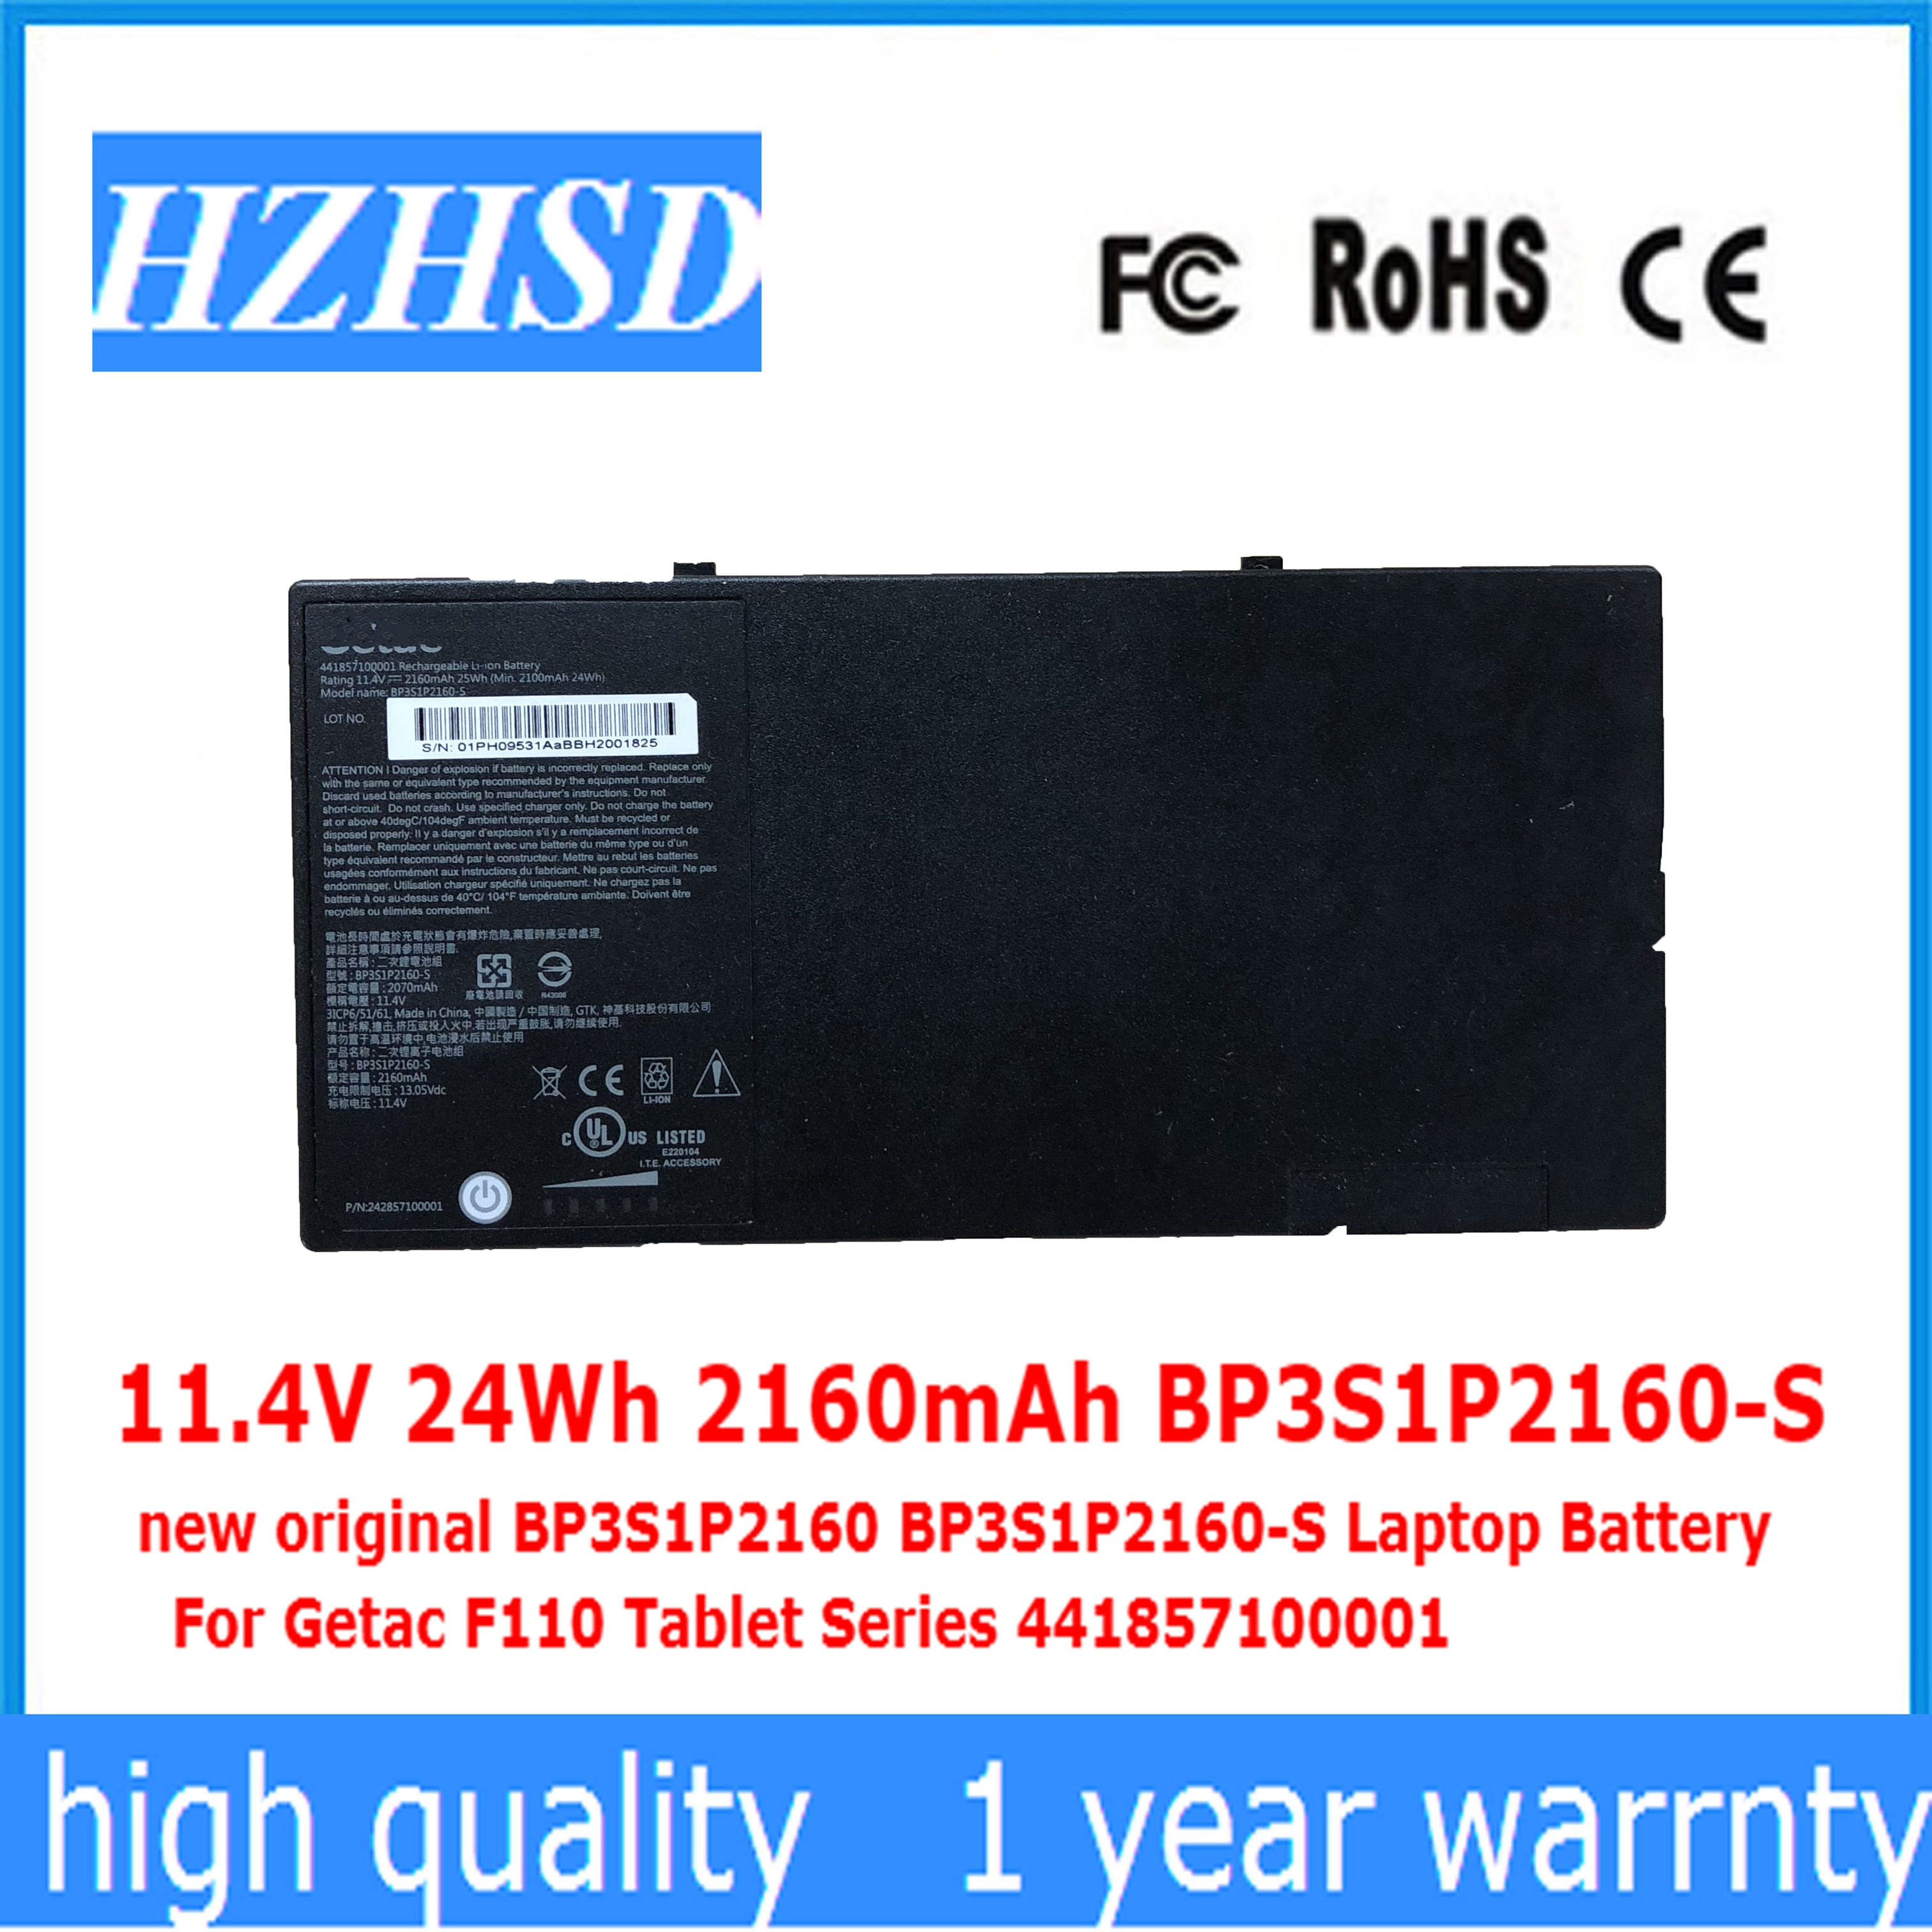 11.4V 24Wh 2160mAh BP3S1P2160-S جديد الأصلي BP3S1P2160 BP3S1P2160-S بطارية كمبيوتر محمول ل Getac F110 اللوحي سلسلة 441857100001